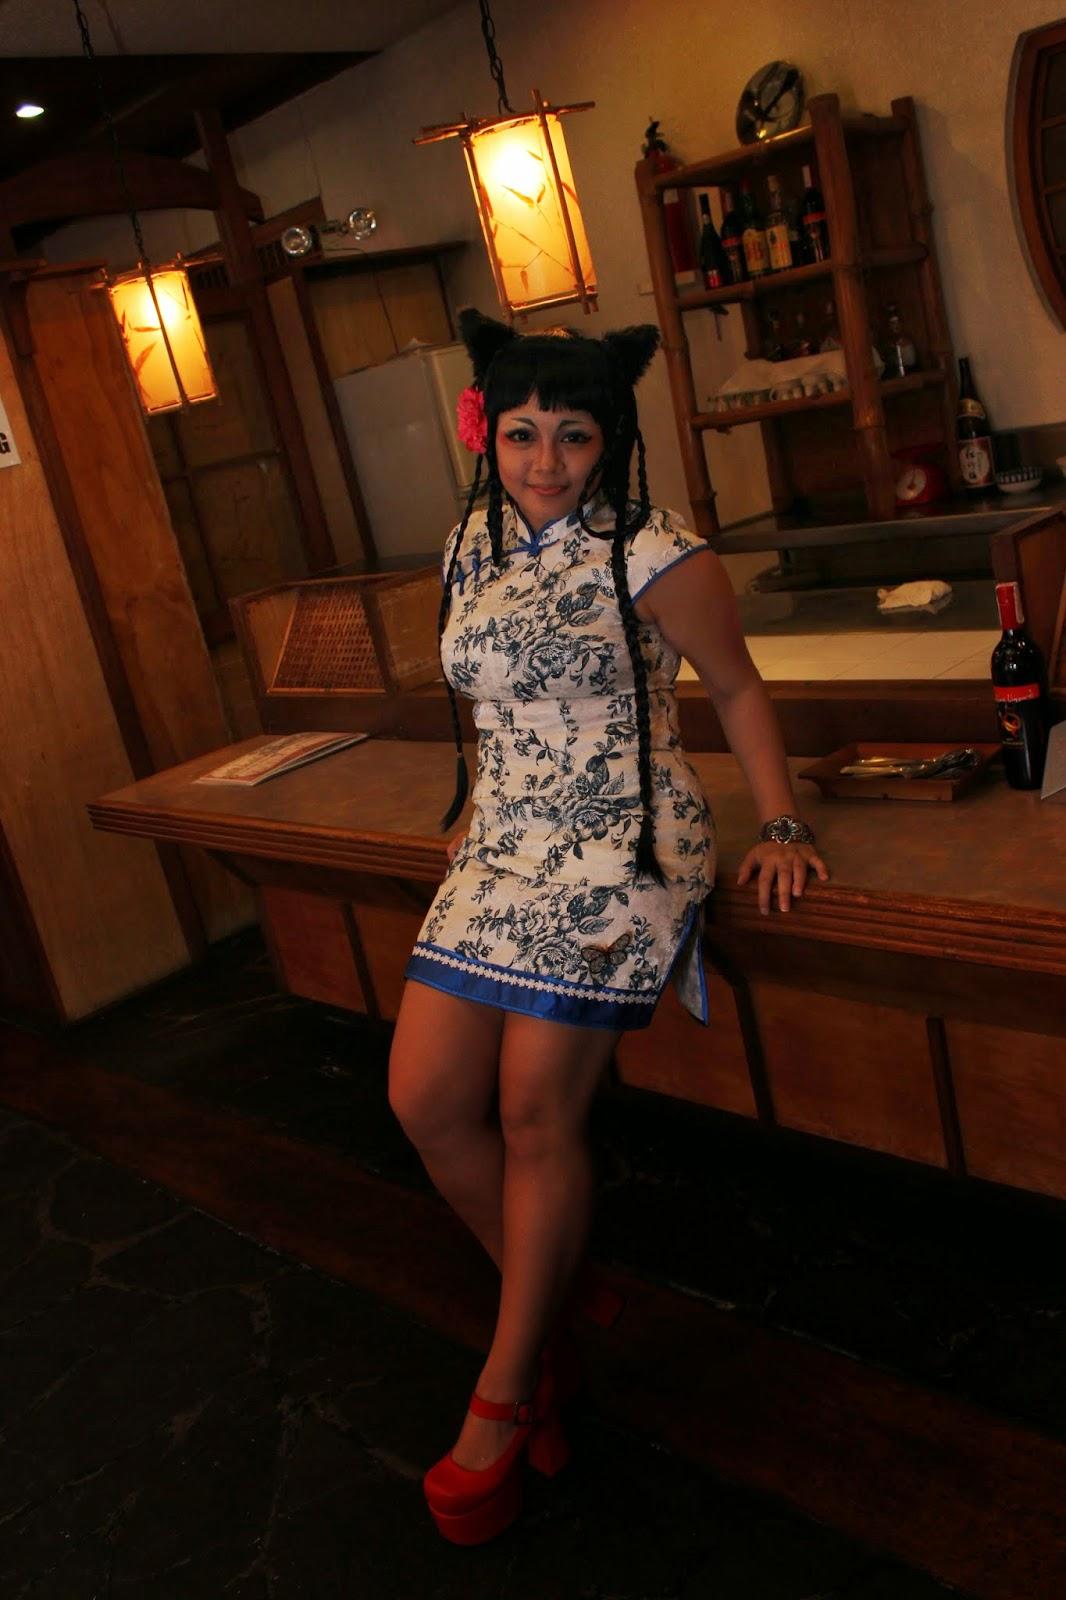 Lara Novales, Cosplay as RanMao from Kuroshitsuji